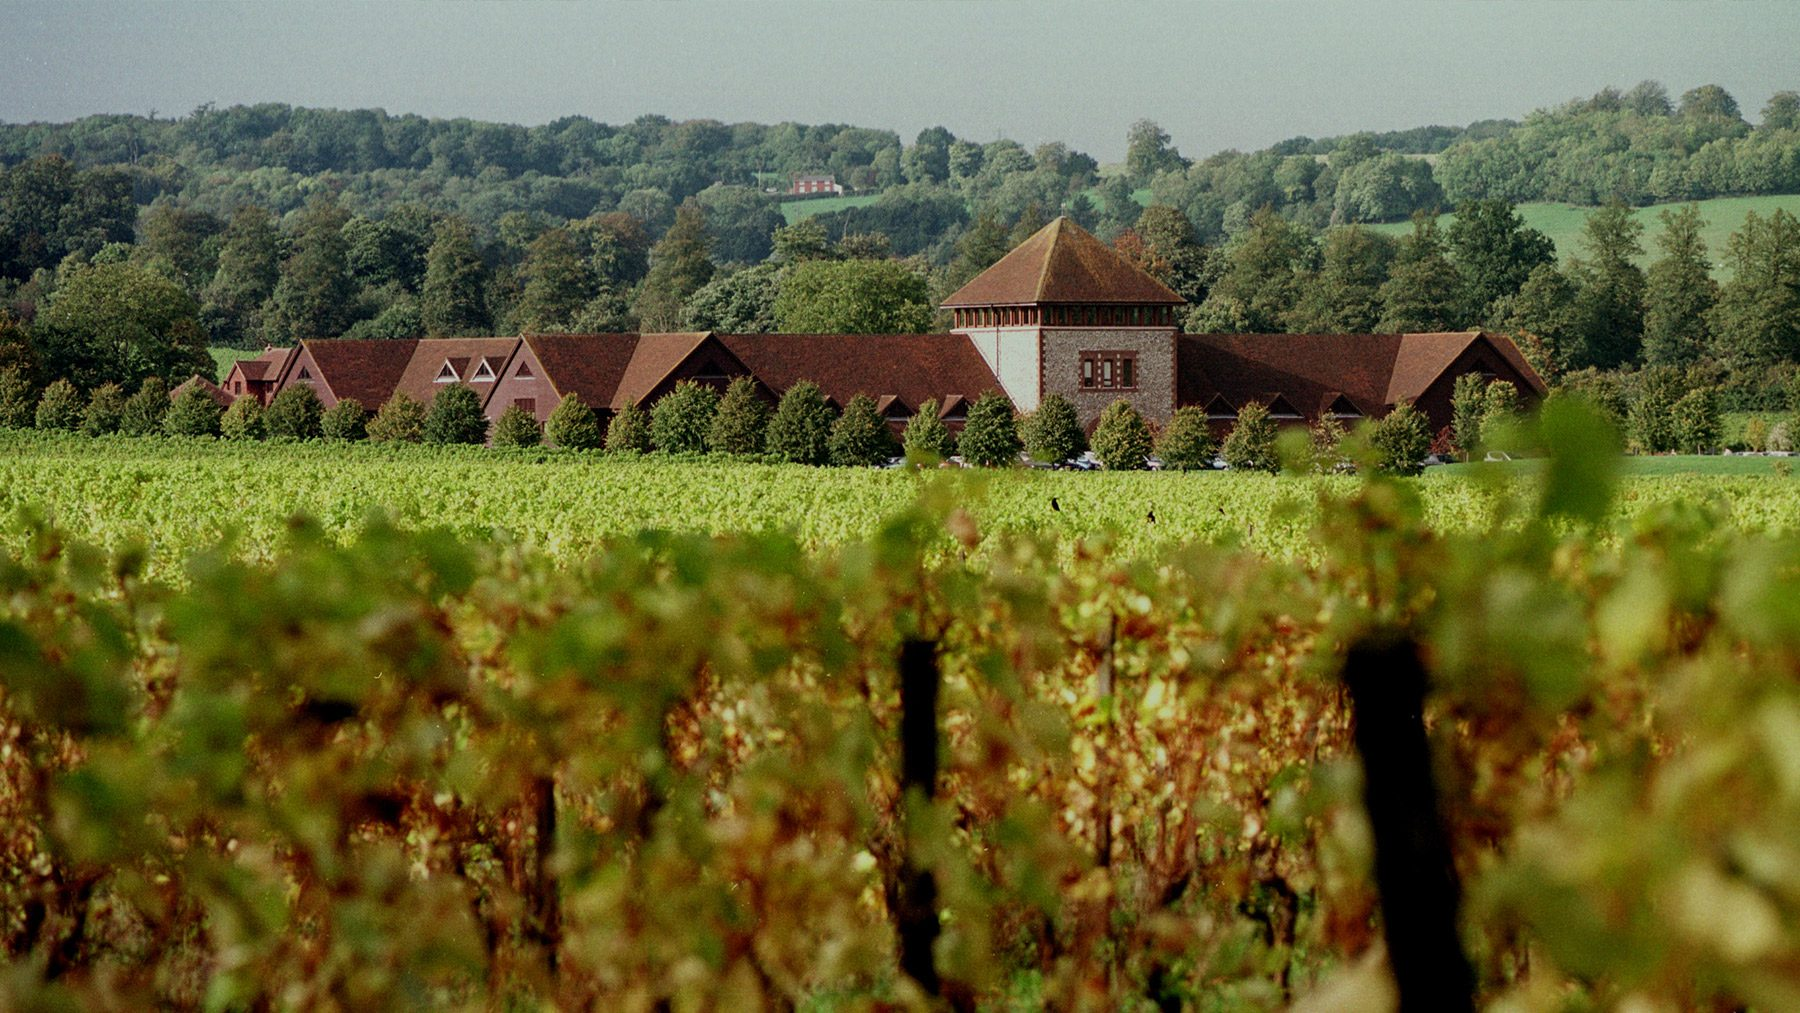 Visit Denbies wine for a vineyard tour